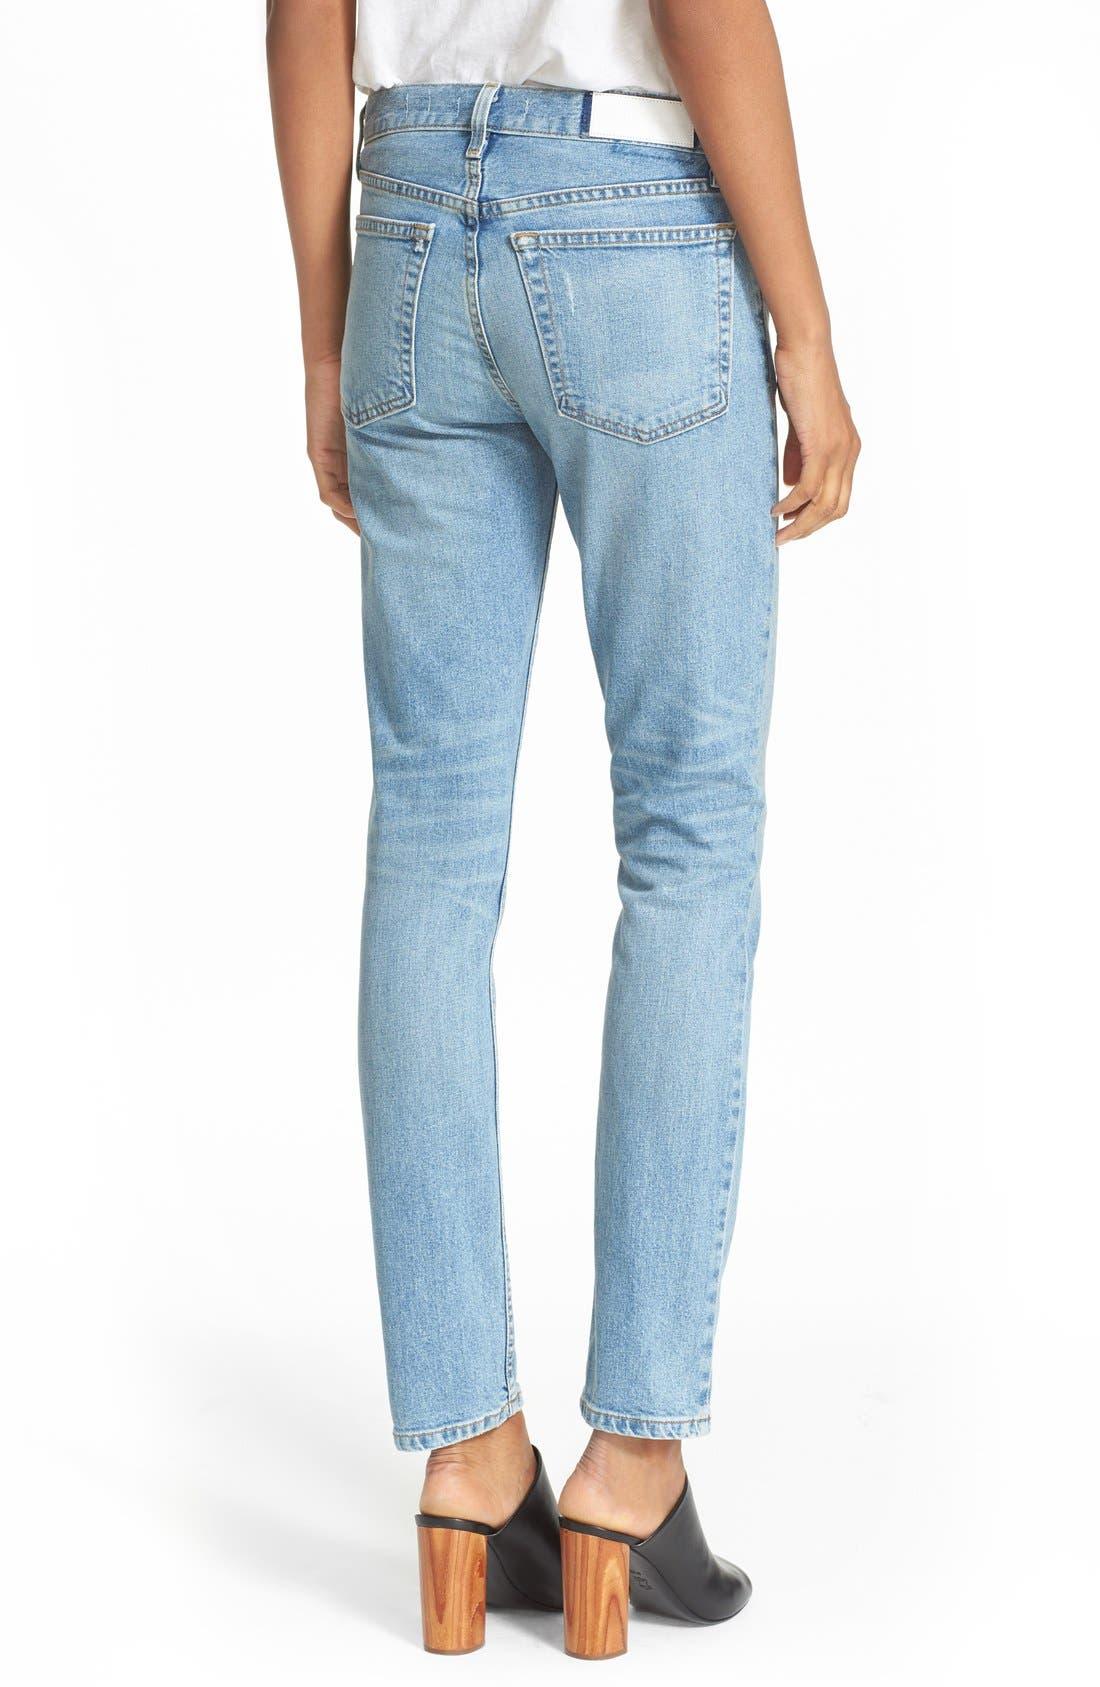 Originals High Waist Straight Skinny Stretch Jeans,                             Alternate thumbnail 2, color,                             Light